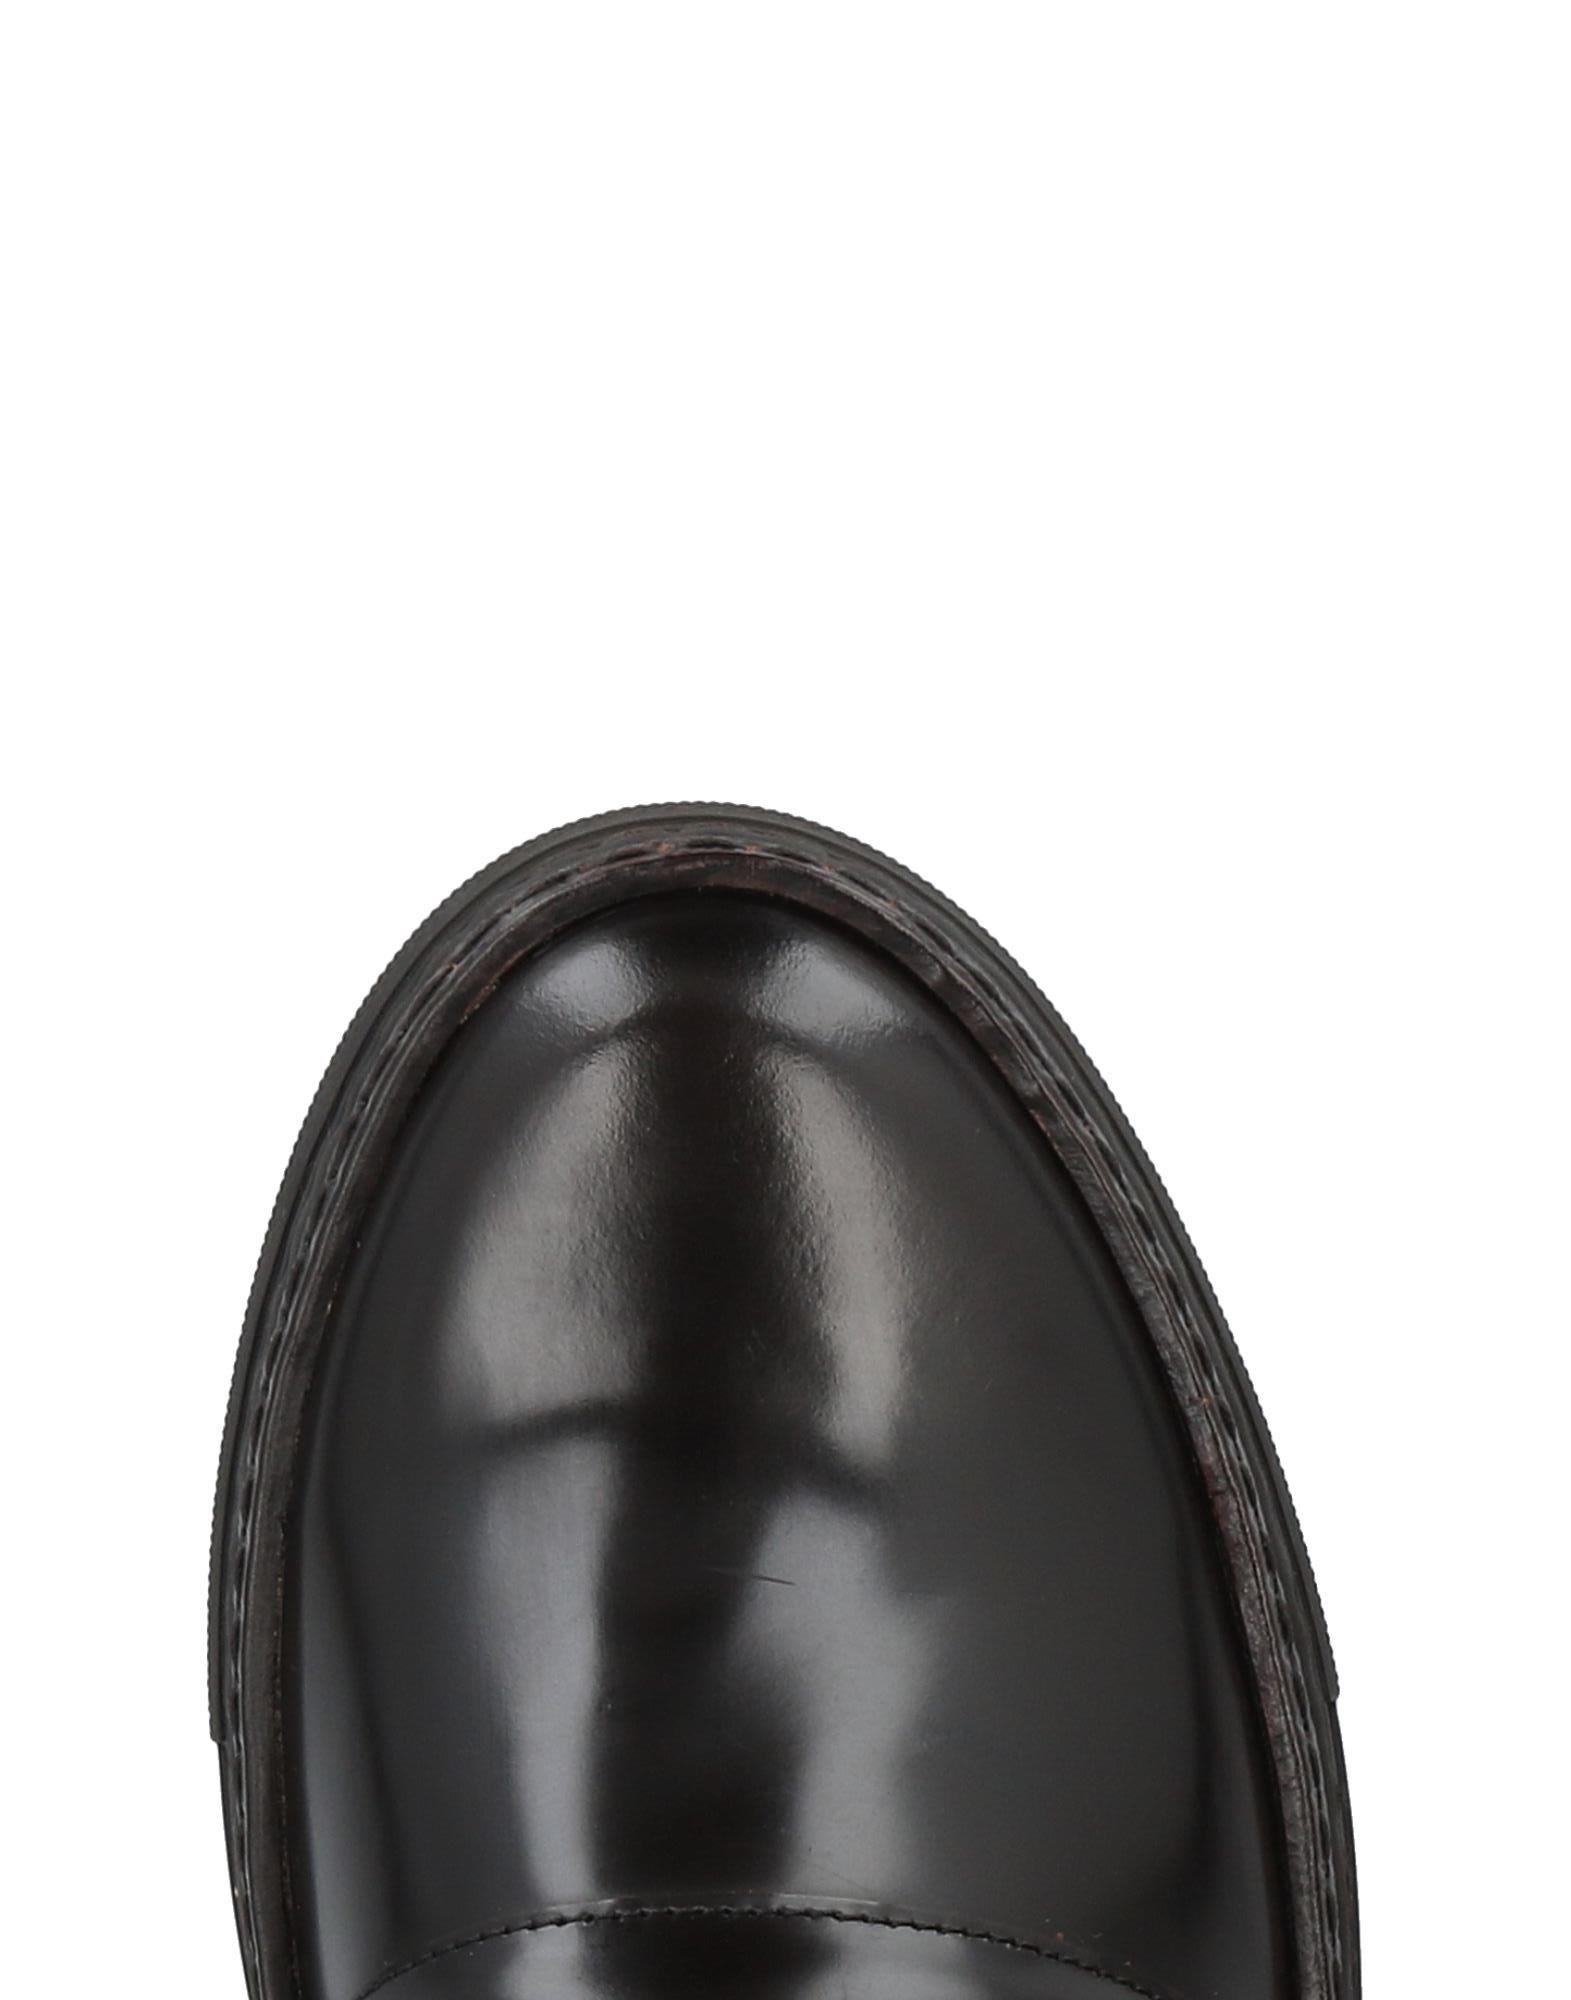 Pantofola D'oro Mokassins 11456484VD Herren  11456484VD Mokassins ca84a5